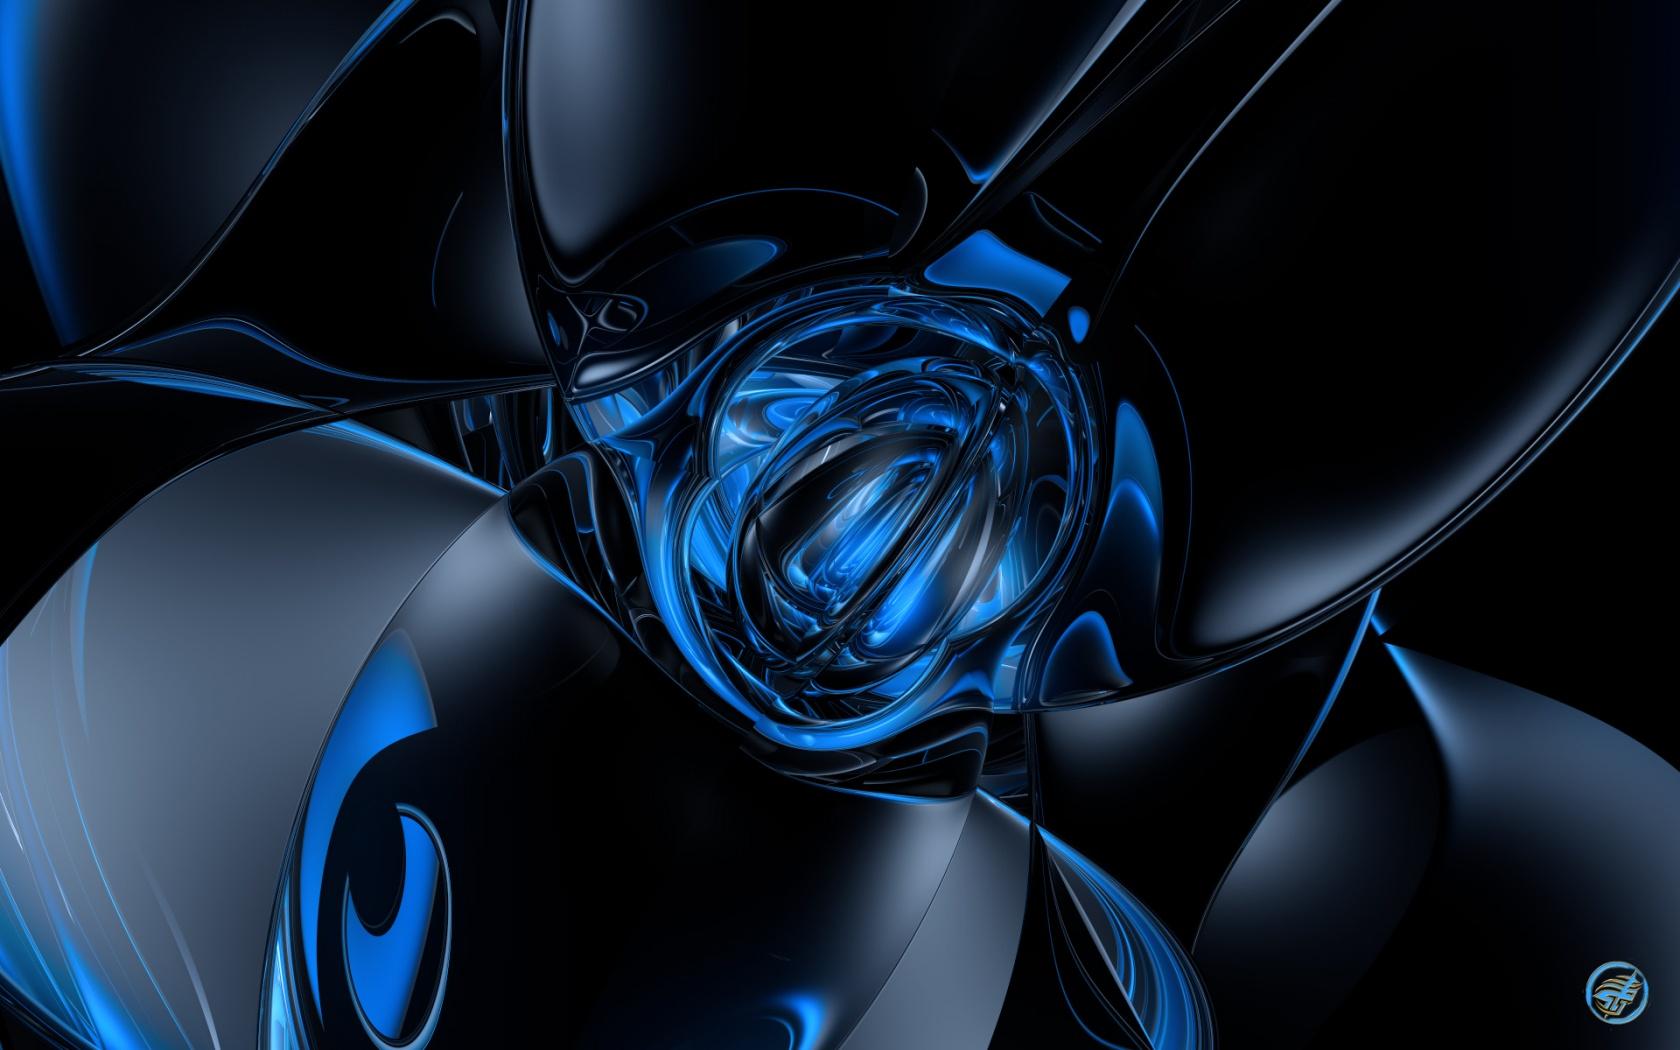 49+] PC HD Wallpaper 3D on WallpaperSafari